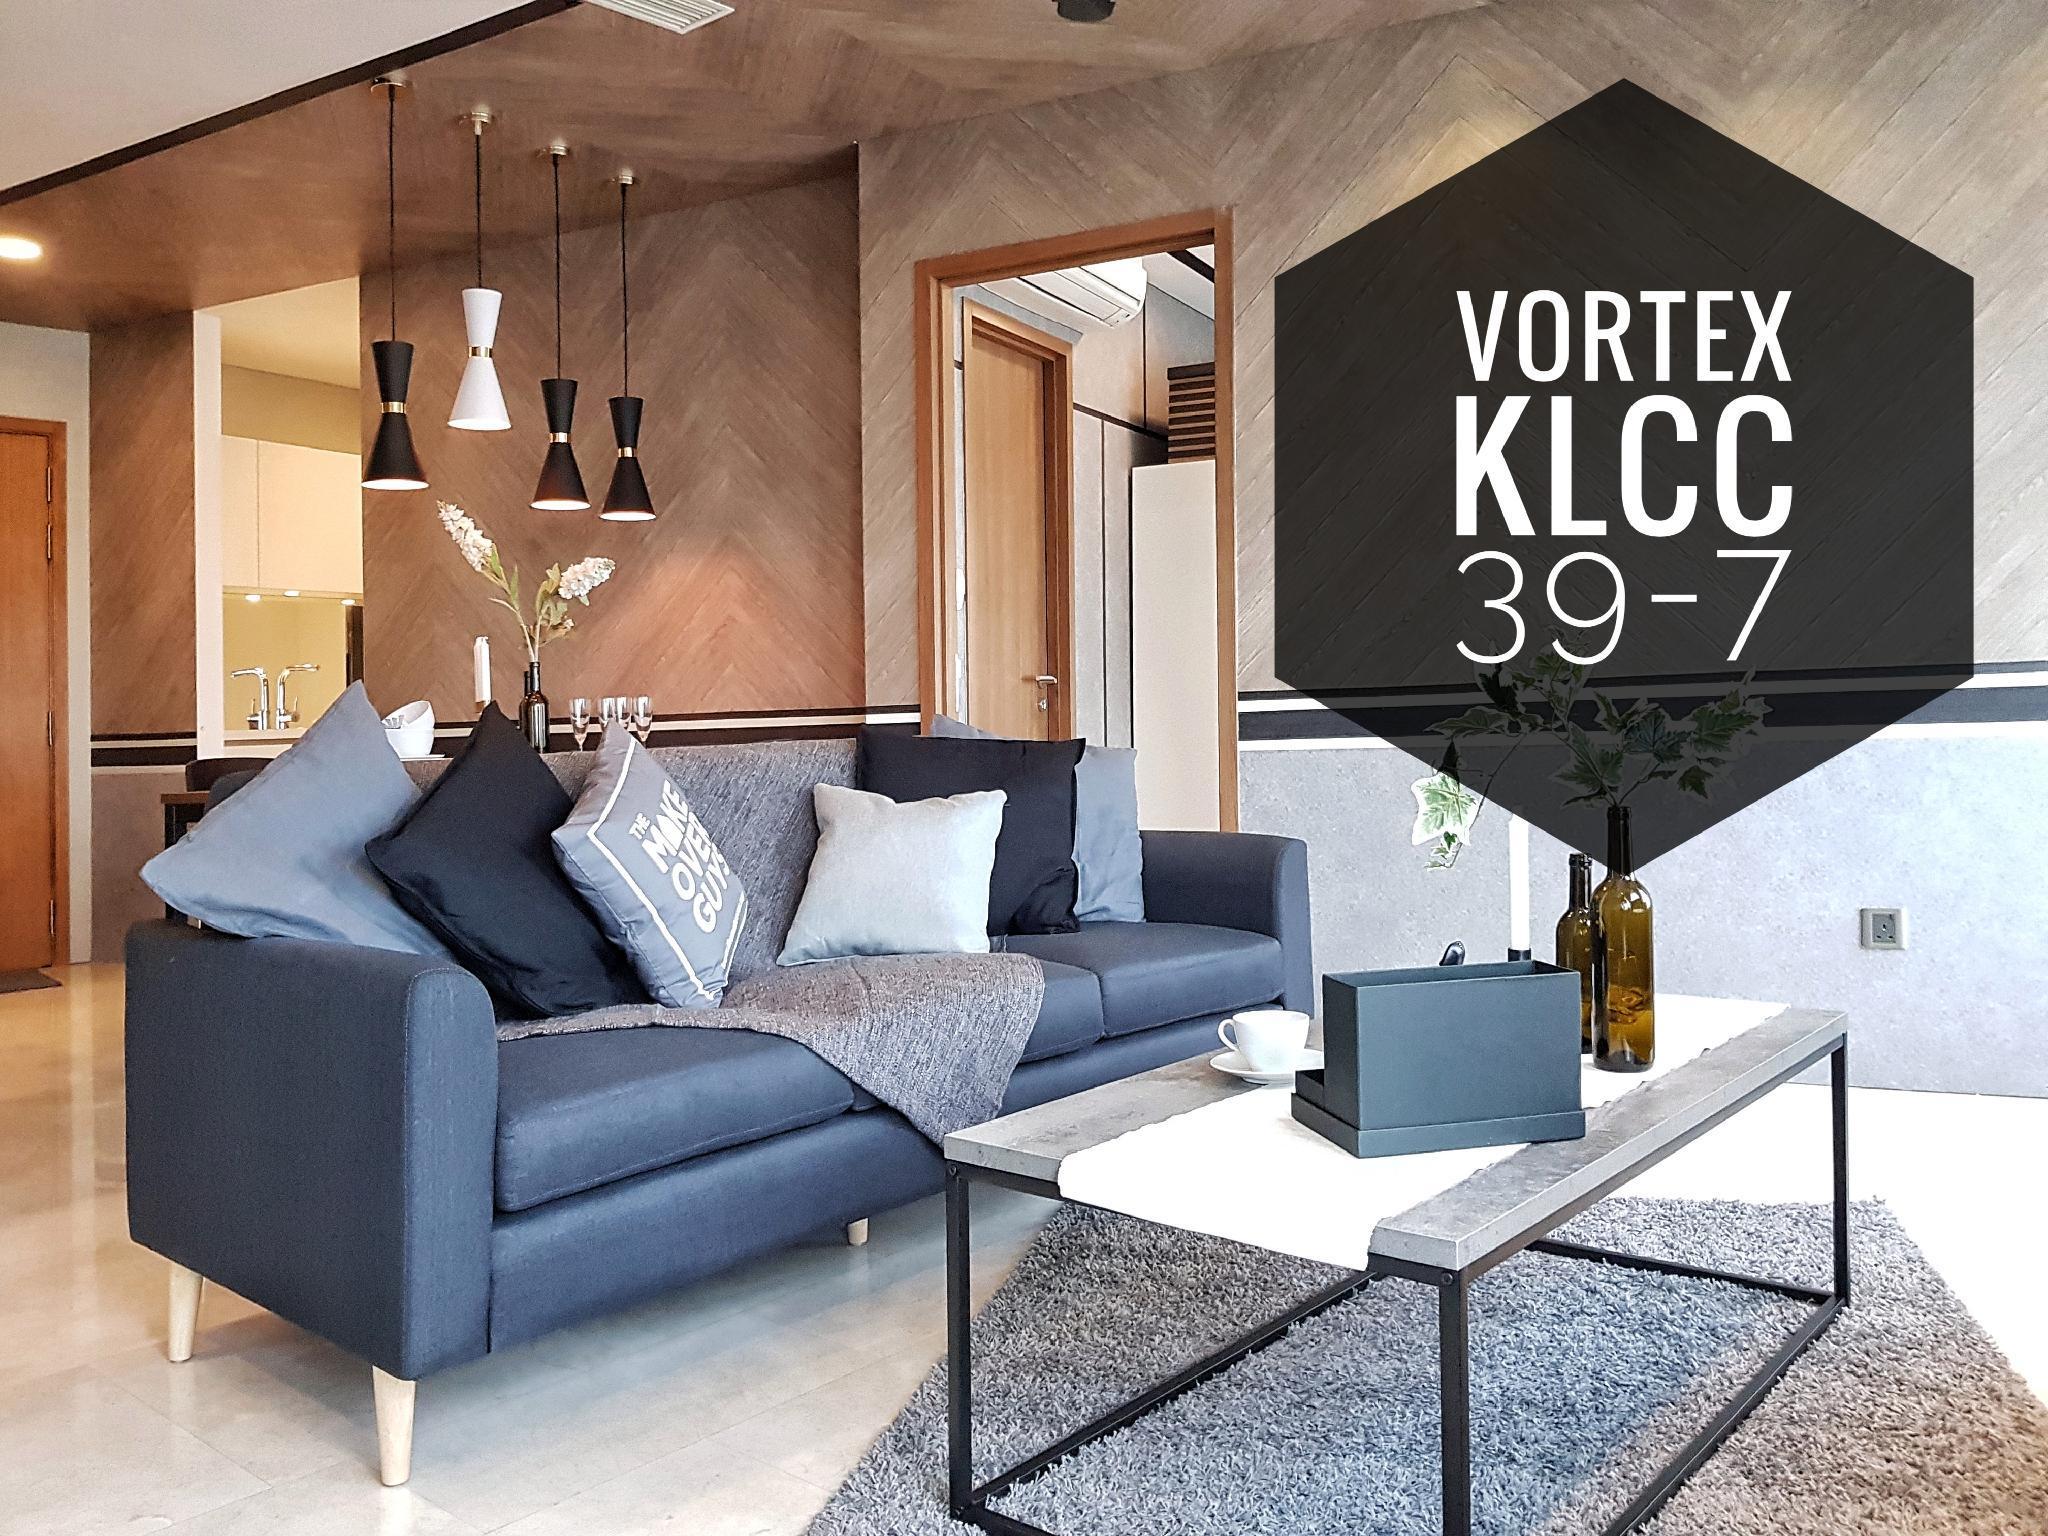 VORTEX KLCC APARTMENT TWIN TOWERS 3